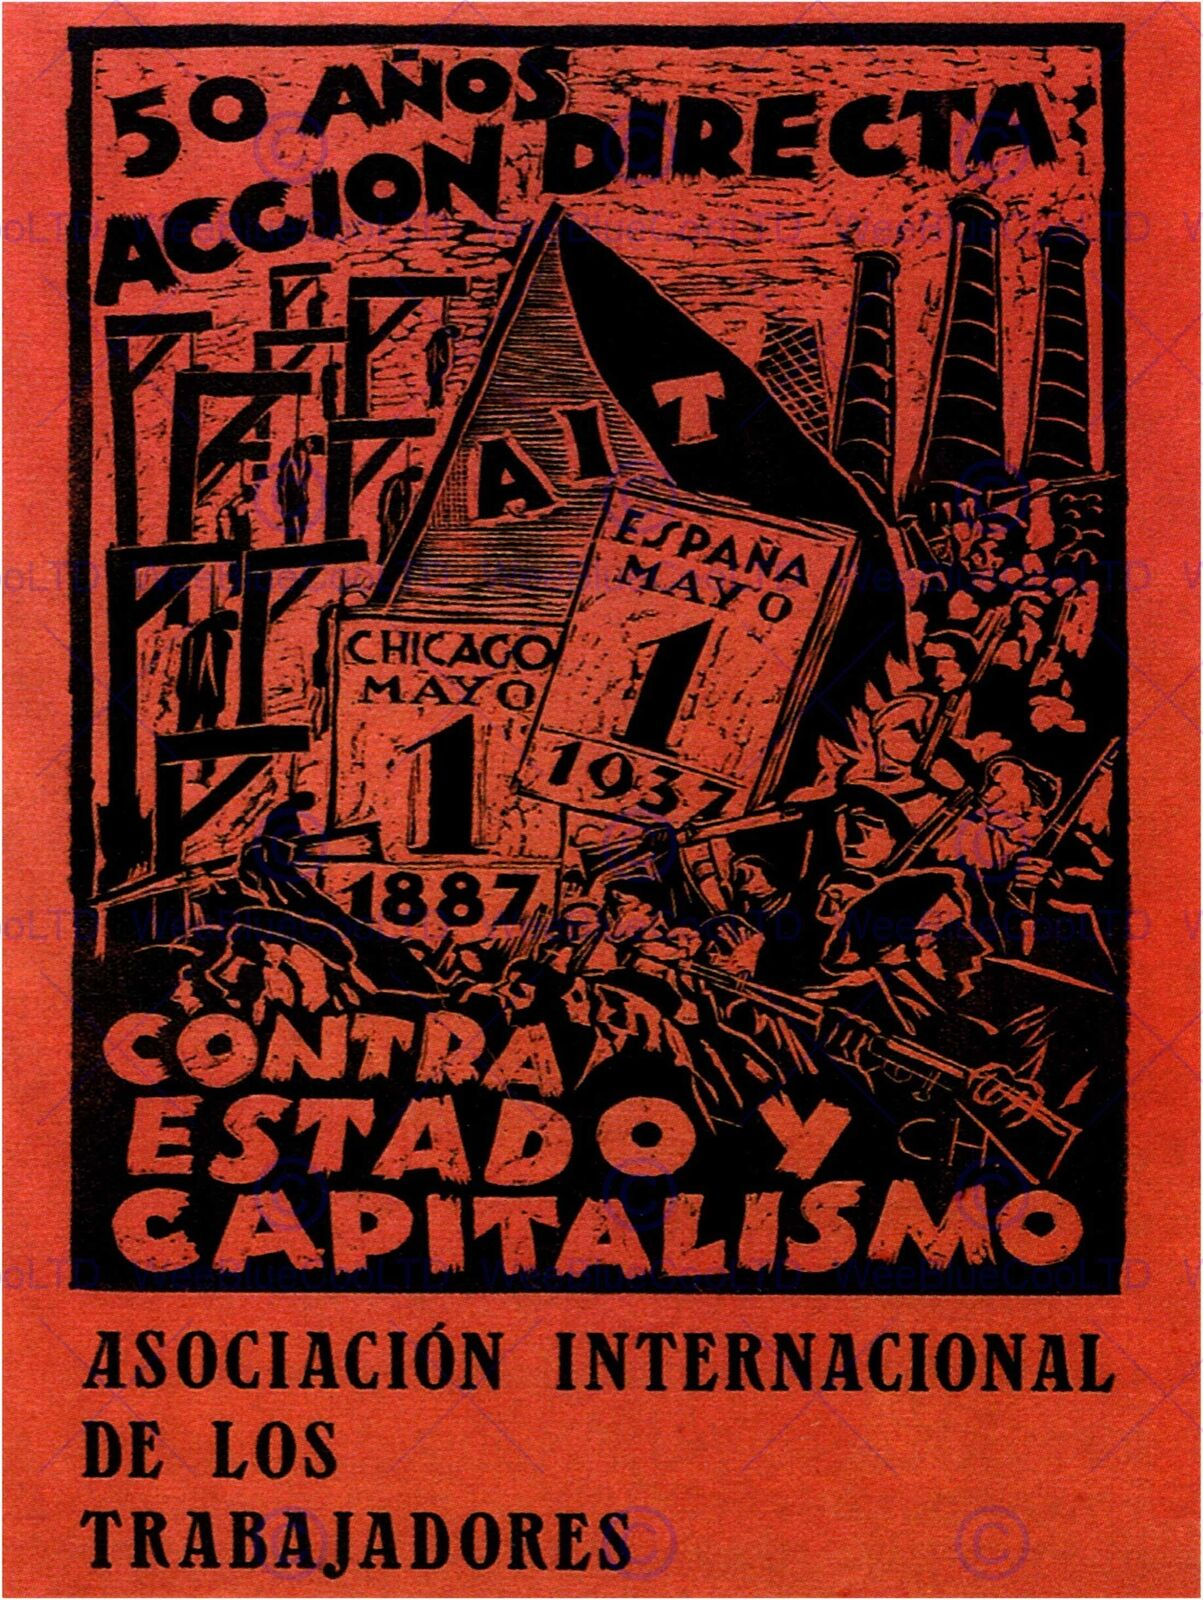 WAR PROPAGANDA SPANISH CIVIL COMMUNIST PARTY REPUBLICAN SPAIN POSTER ART 2792PY